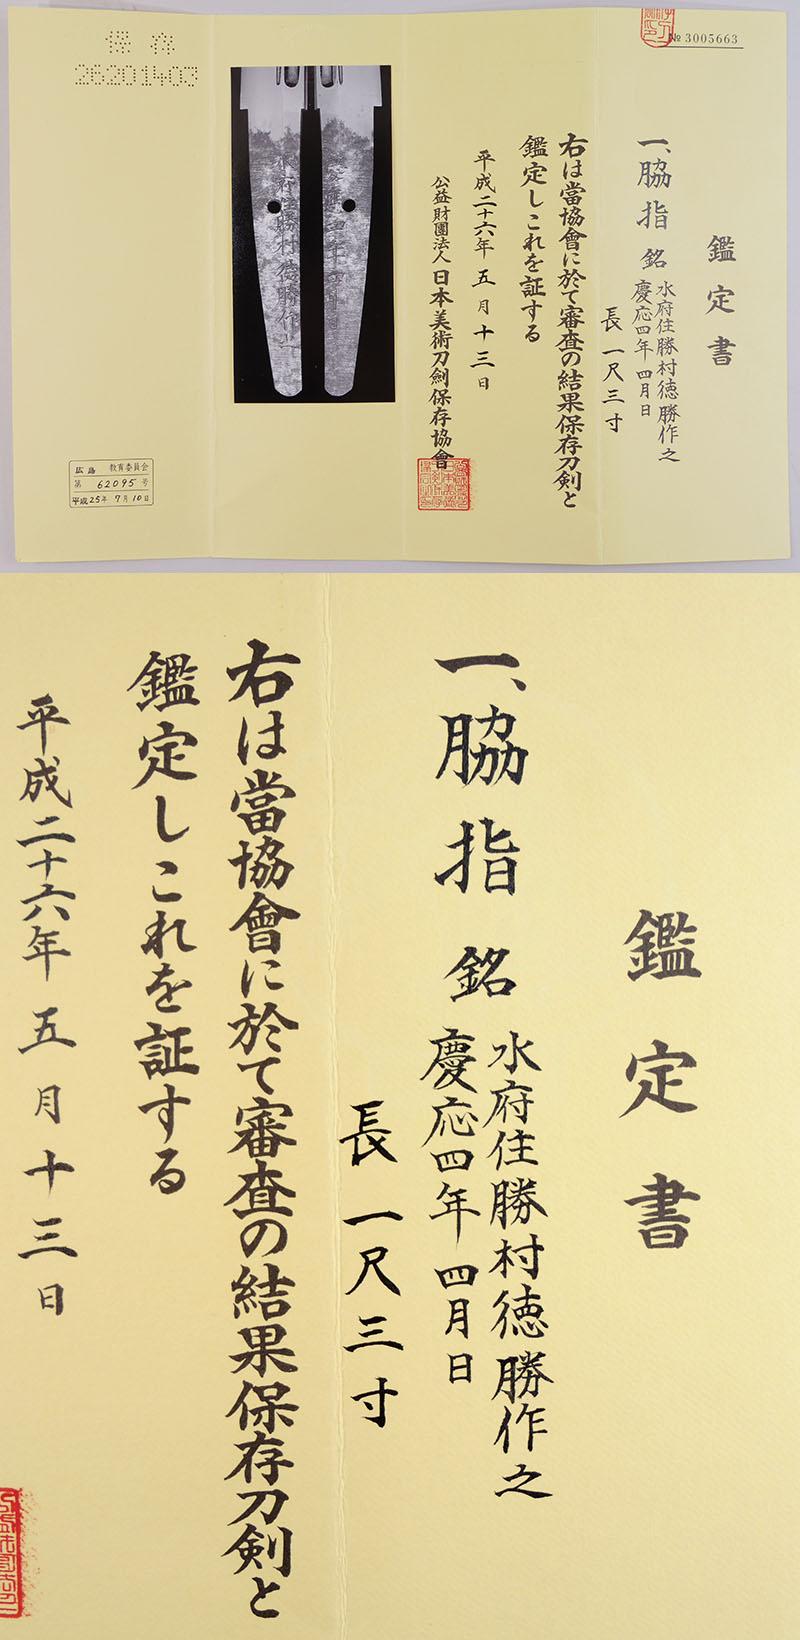 水府住勝村徳勝作之 Picture of Certificate